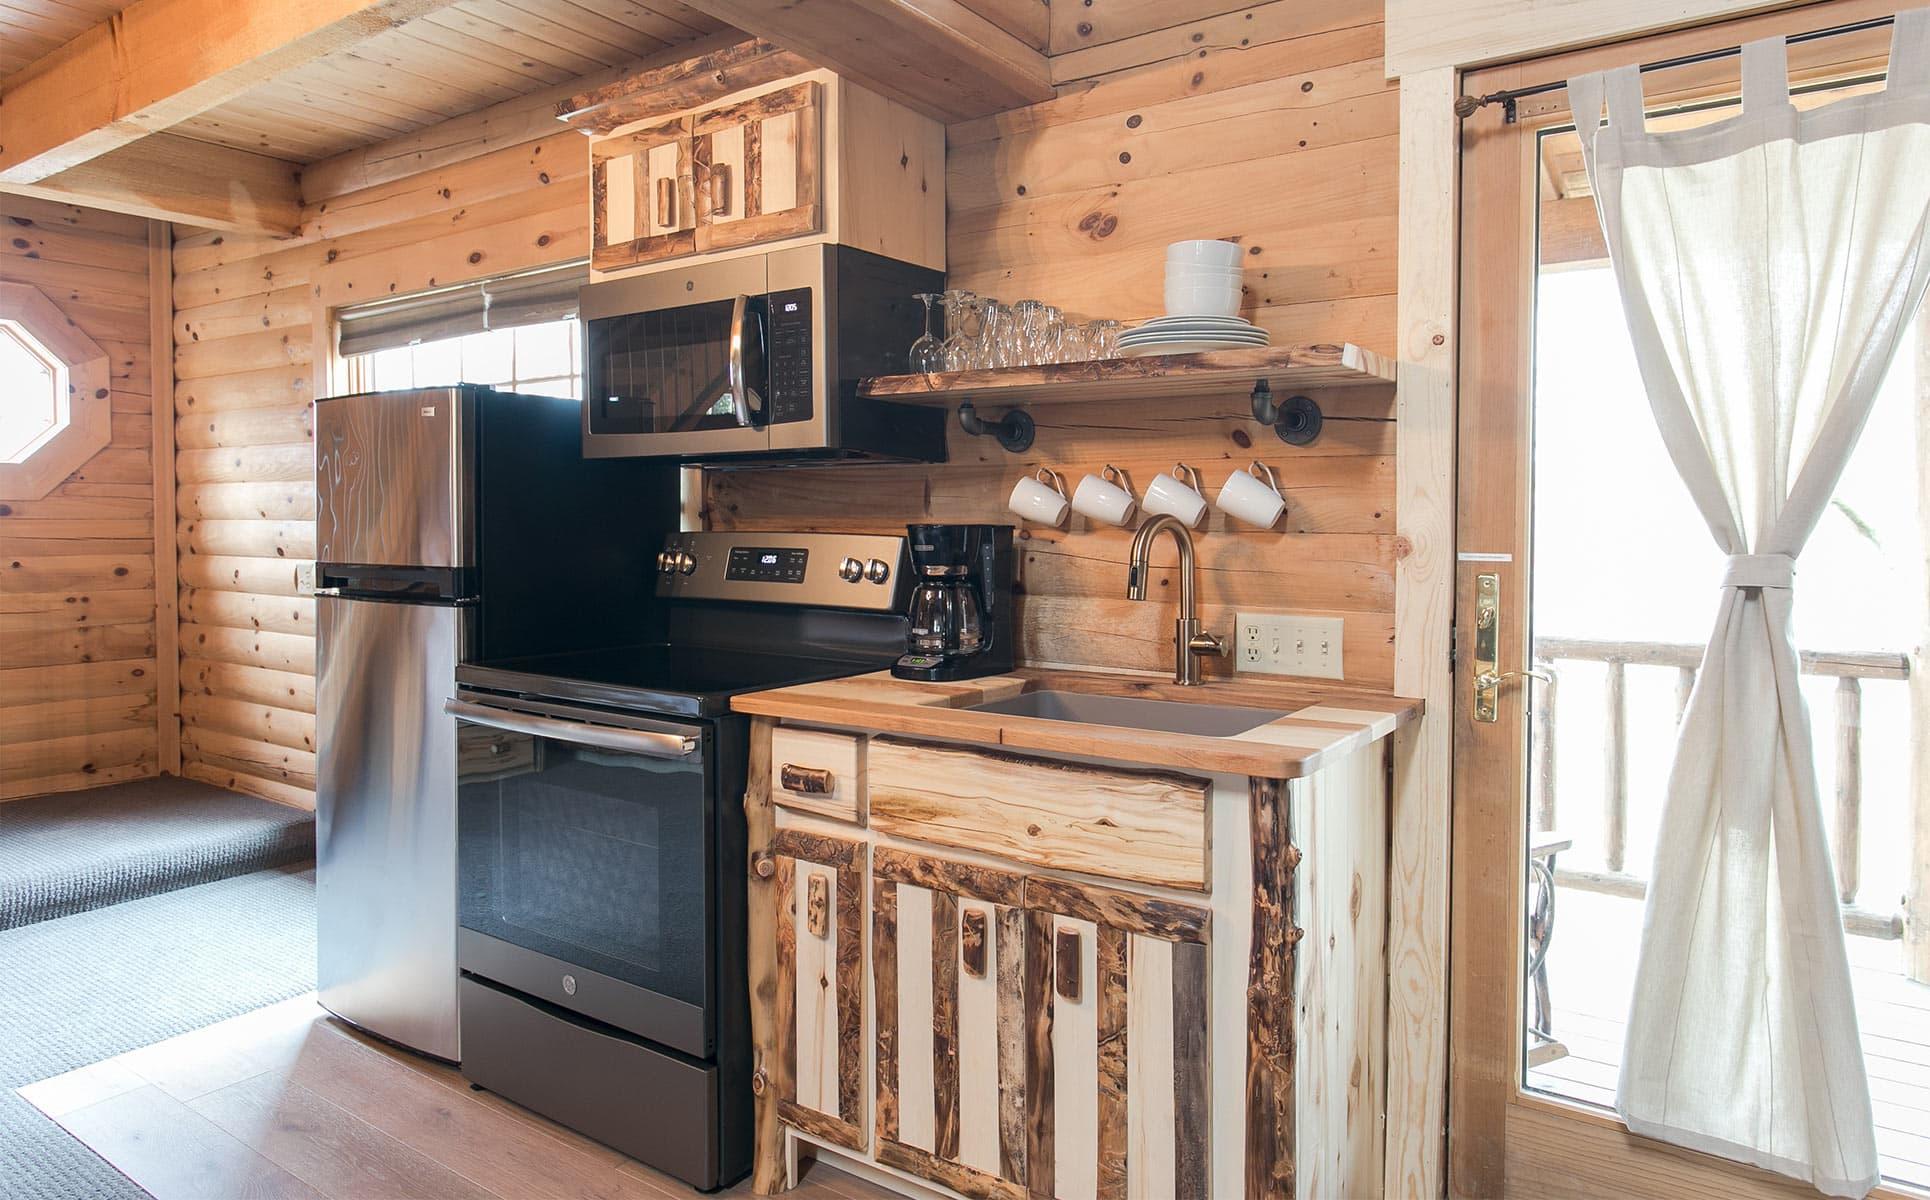 Kitchen with range, micro, and fridge